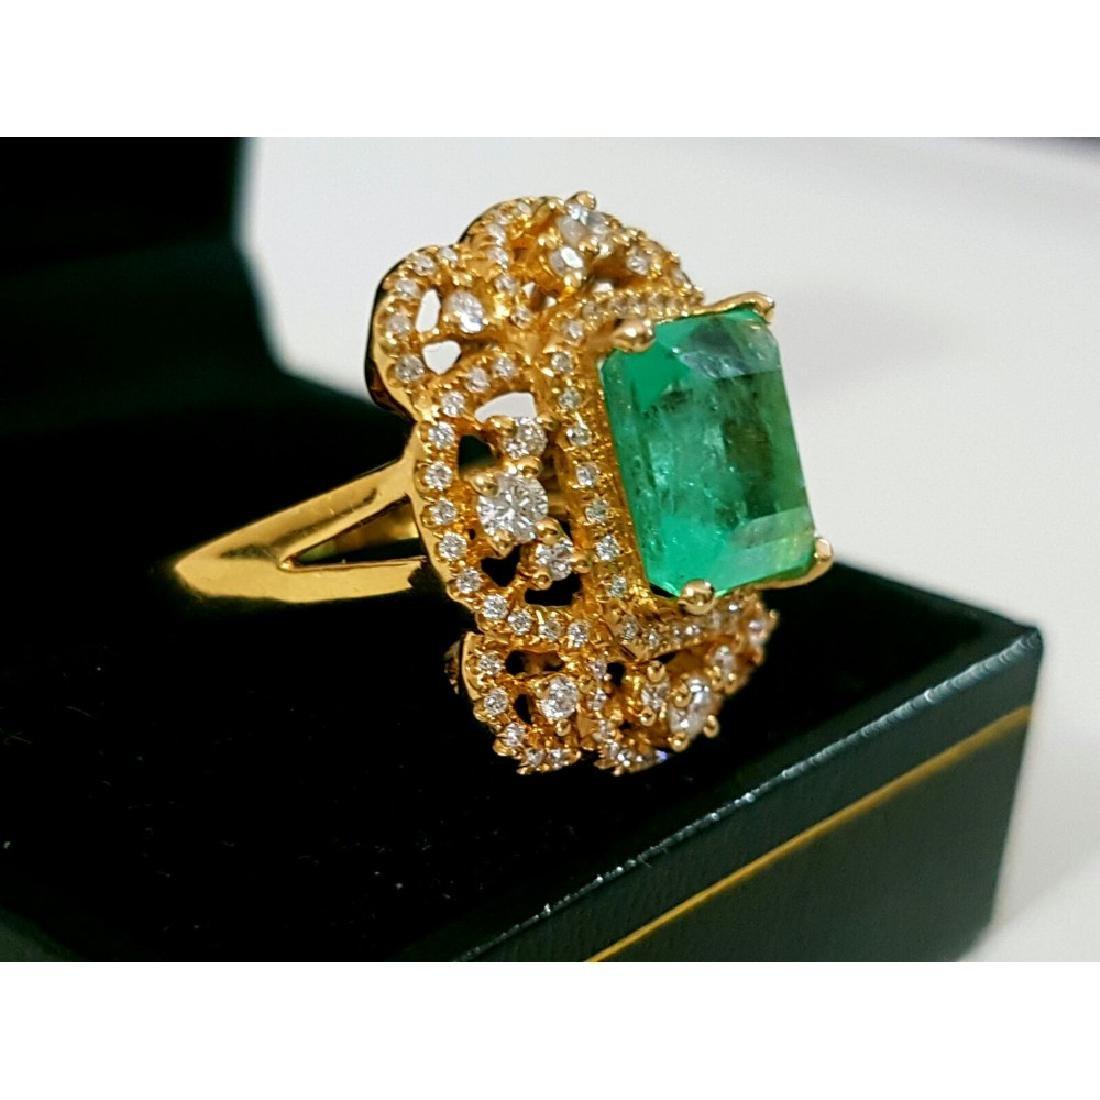 18k Gold Vintage 6 ct Emerald Diamond Cocktail Ring - 2